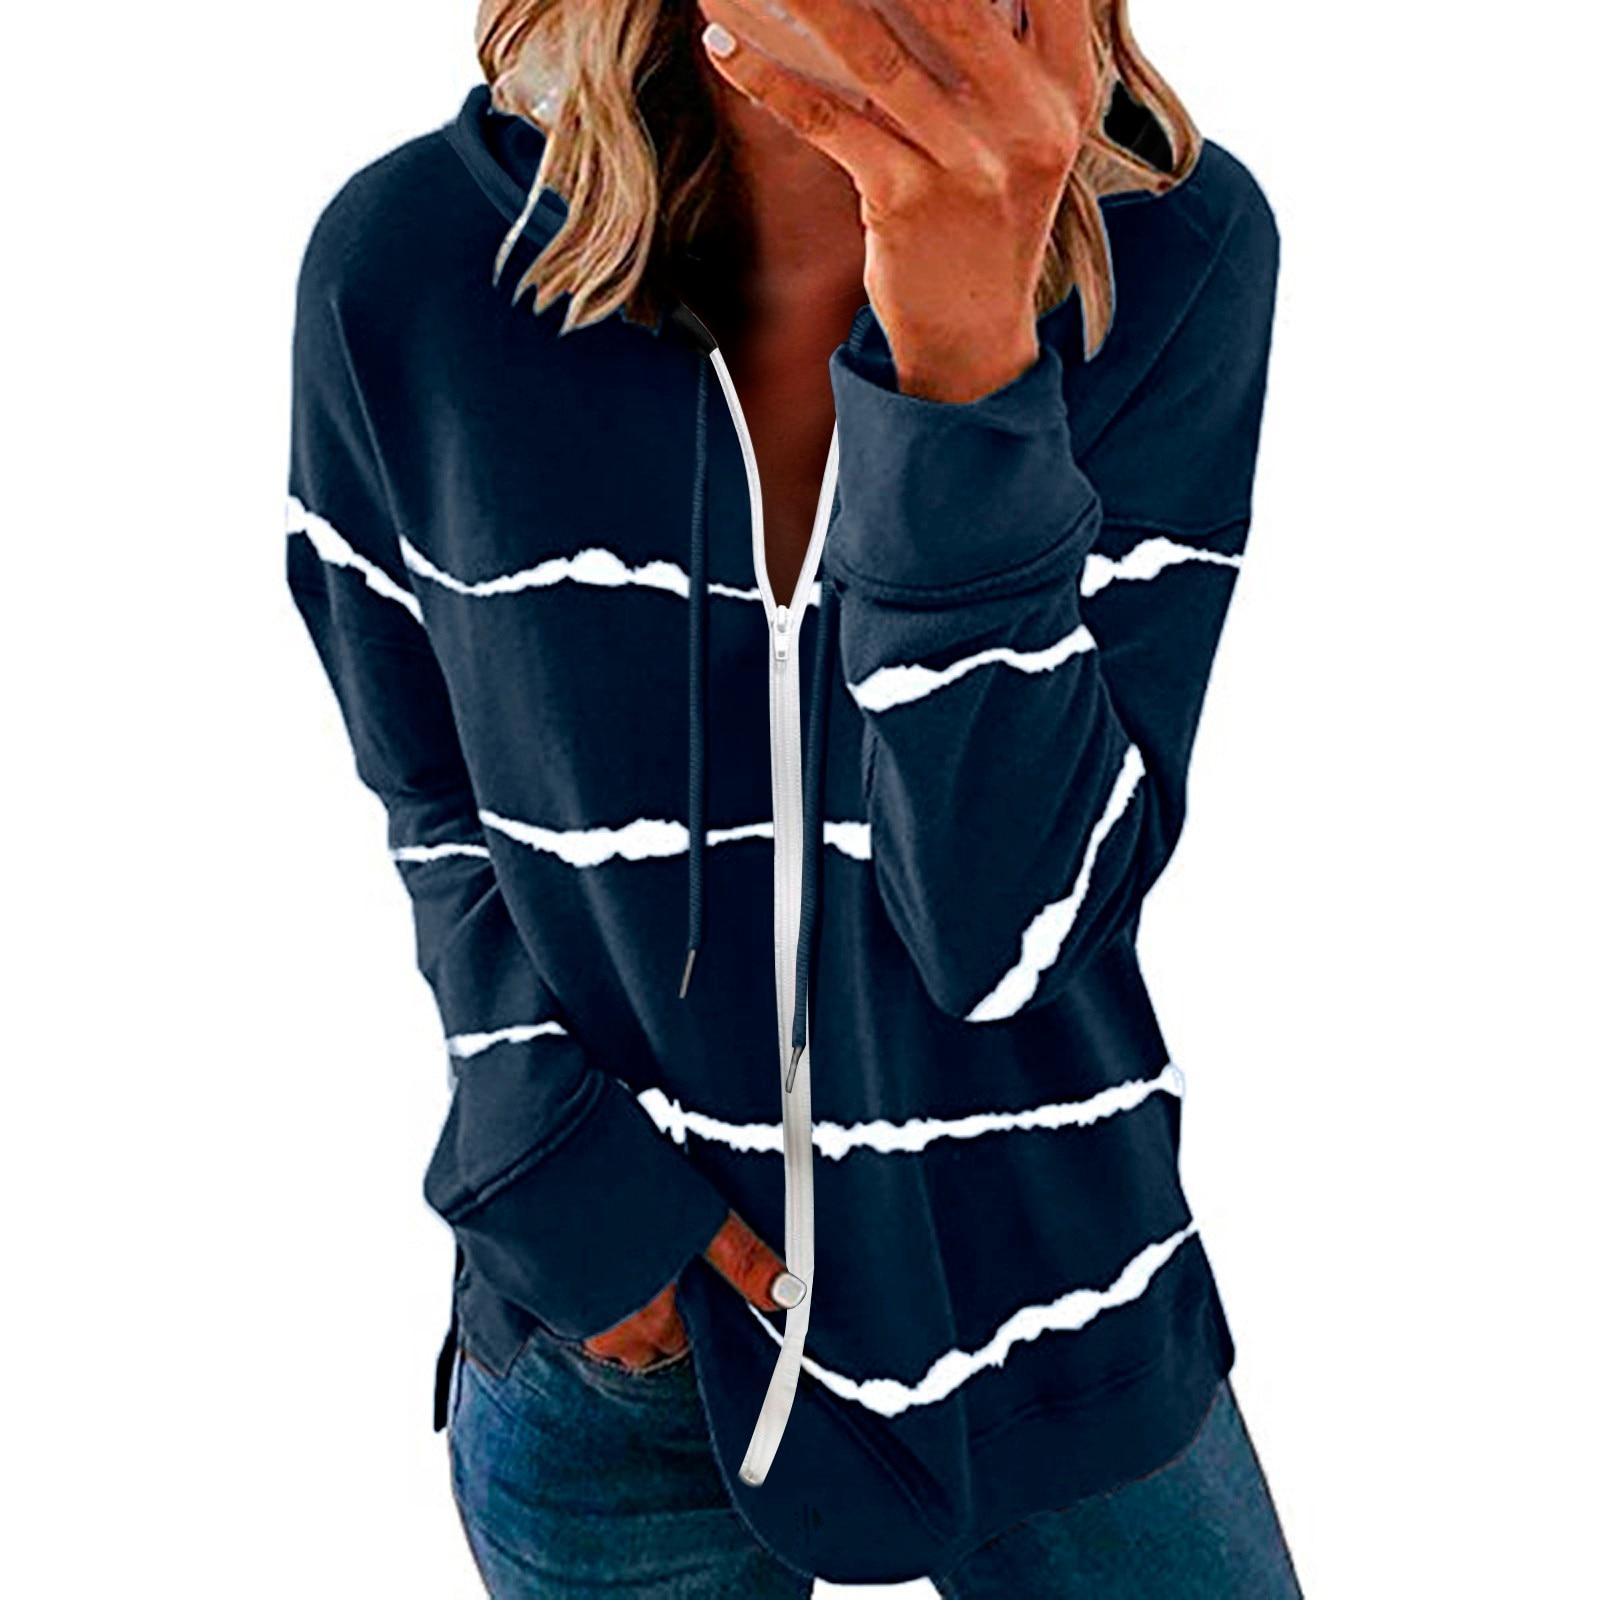 40#Womens Hoodie Striped Full Zipper Long Sleeve Lightweight Sweatshirts Spring Elegant Pullover Tee Tops толстовка женская 14